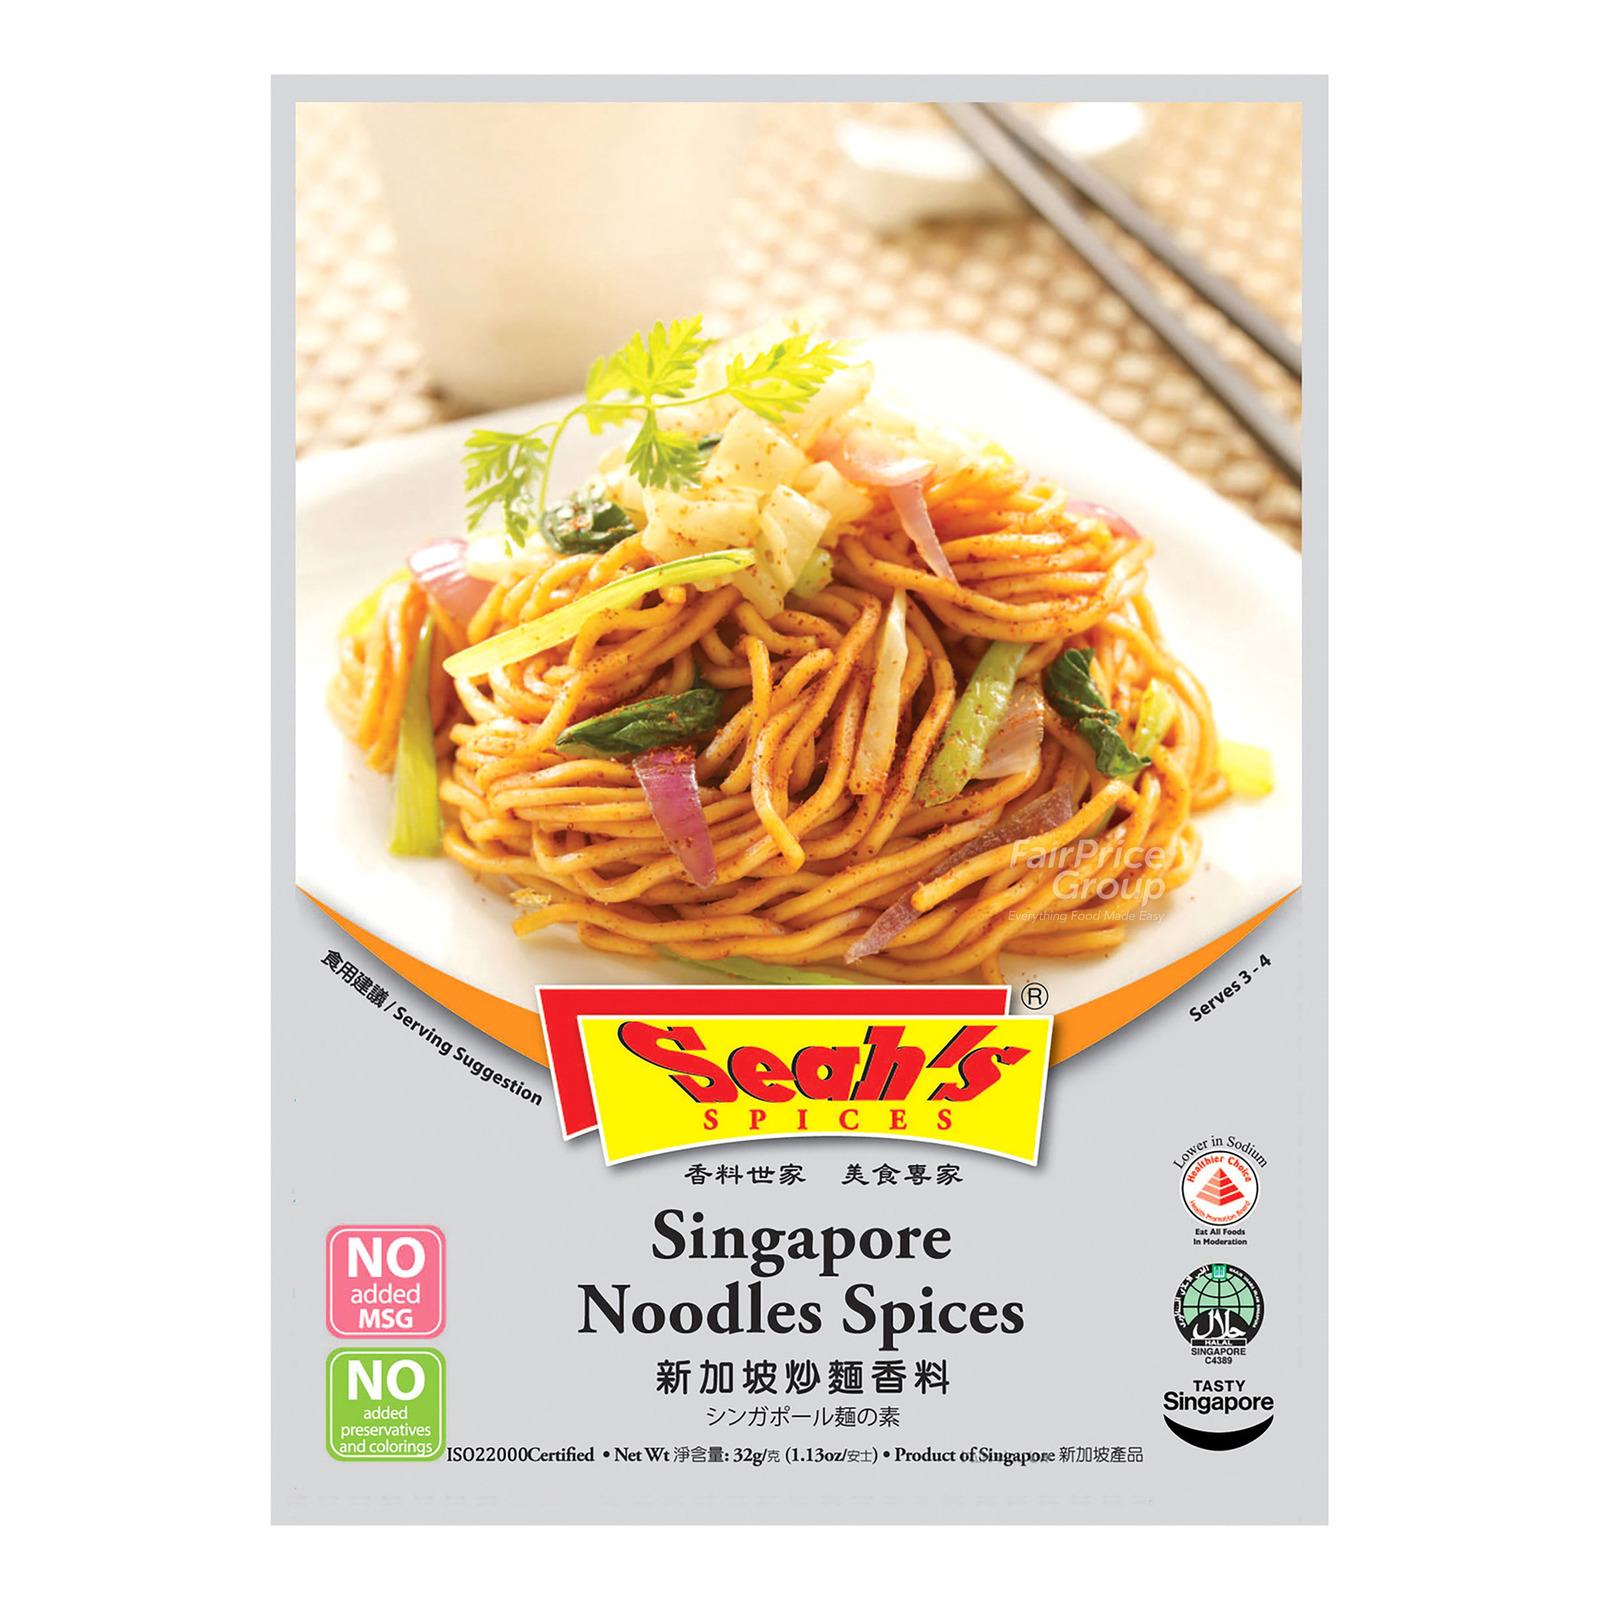 Seah's Spices Singapore Fried Noodles Spices